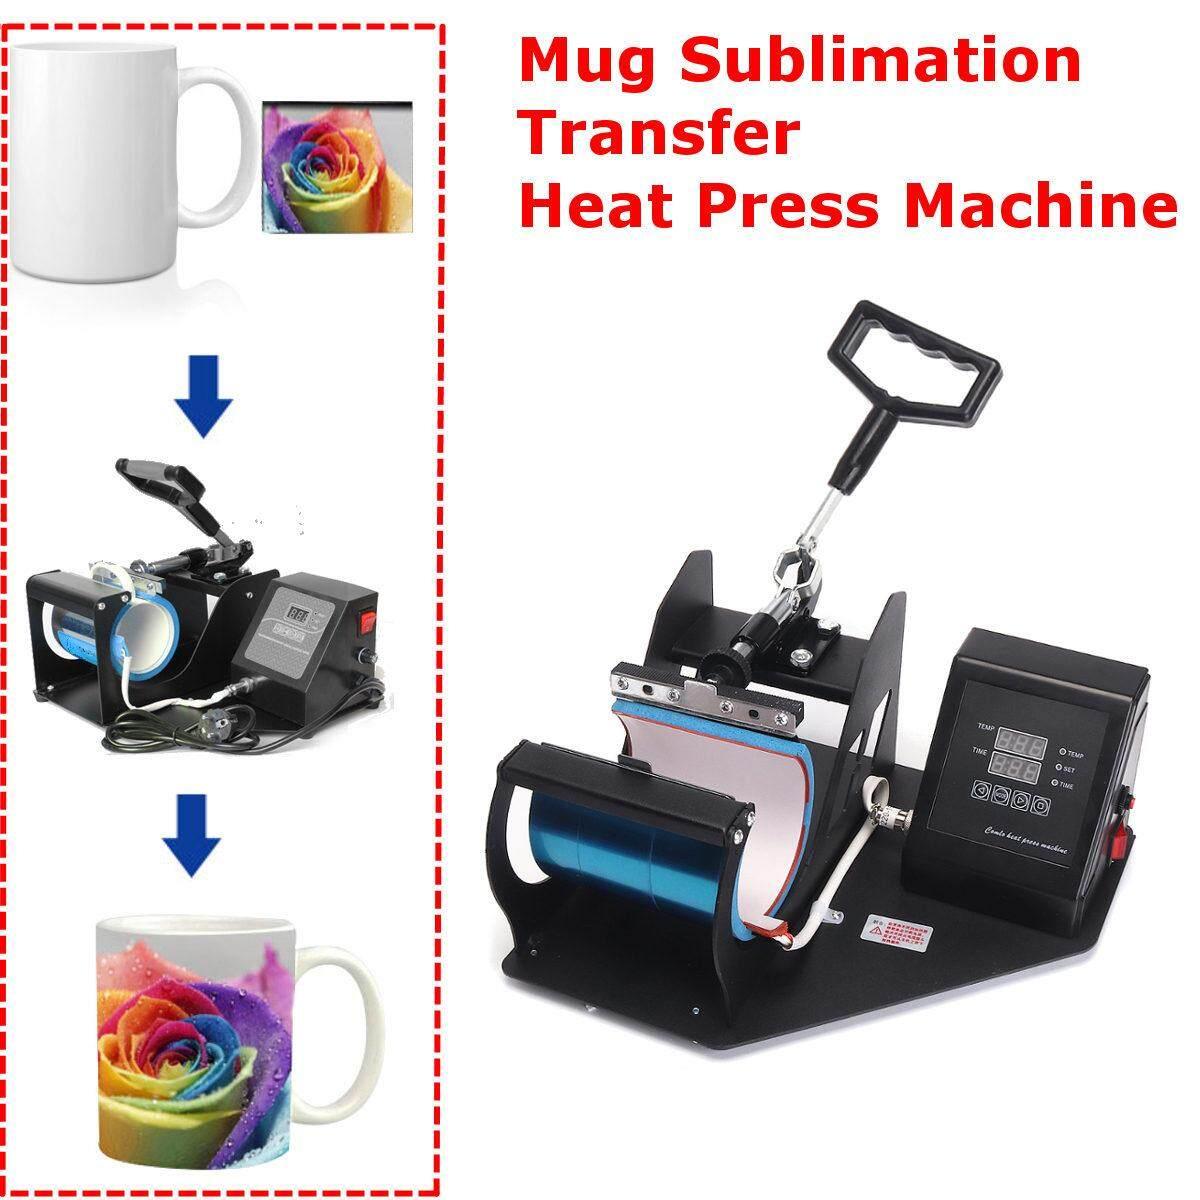 350w Coffee Mug 9oz-15oz Cup Sublimation Heat Press Transfer Machine Diy Printer By Audew.